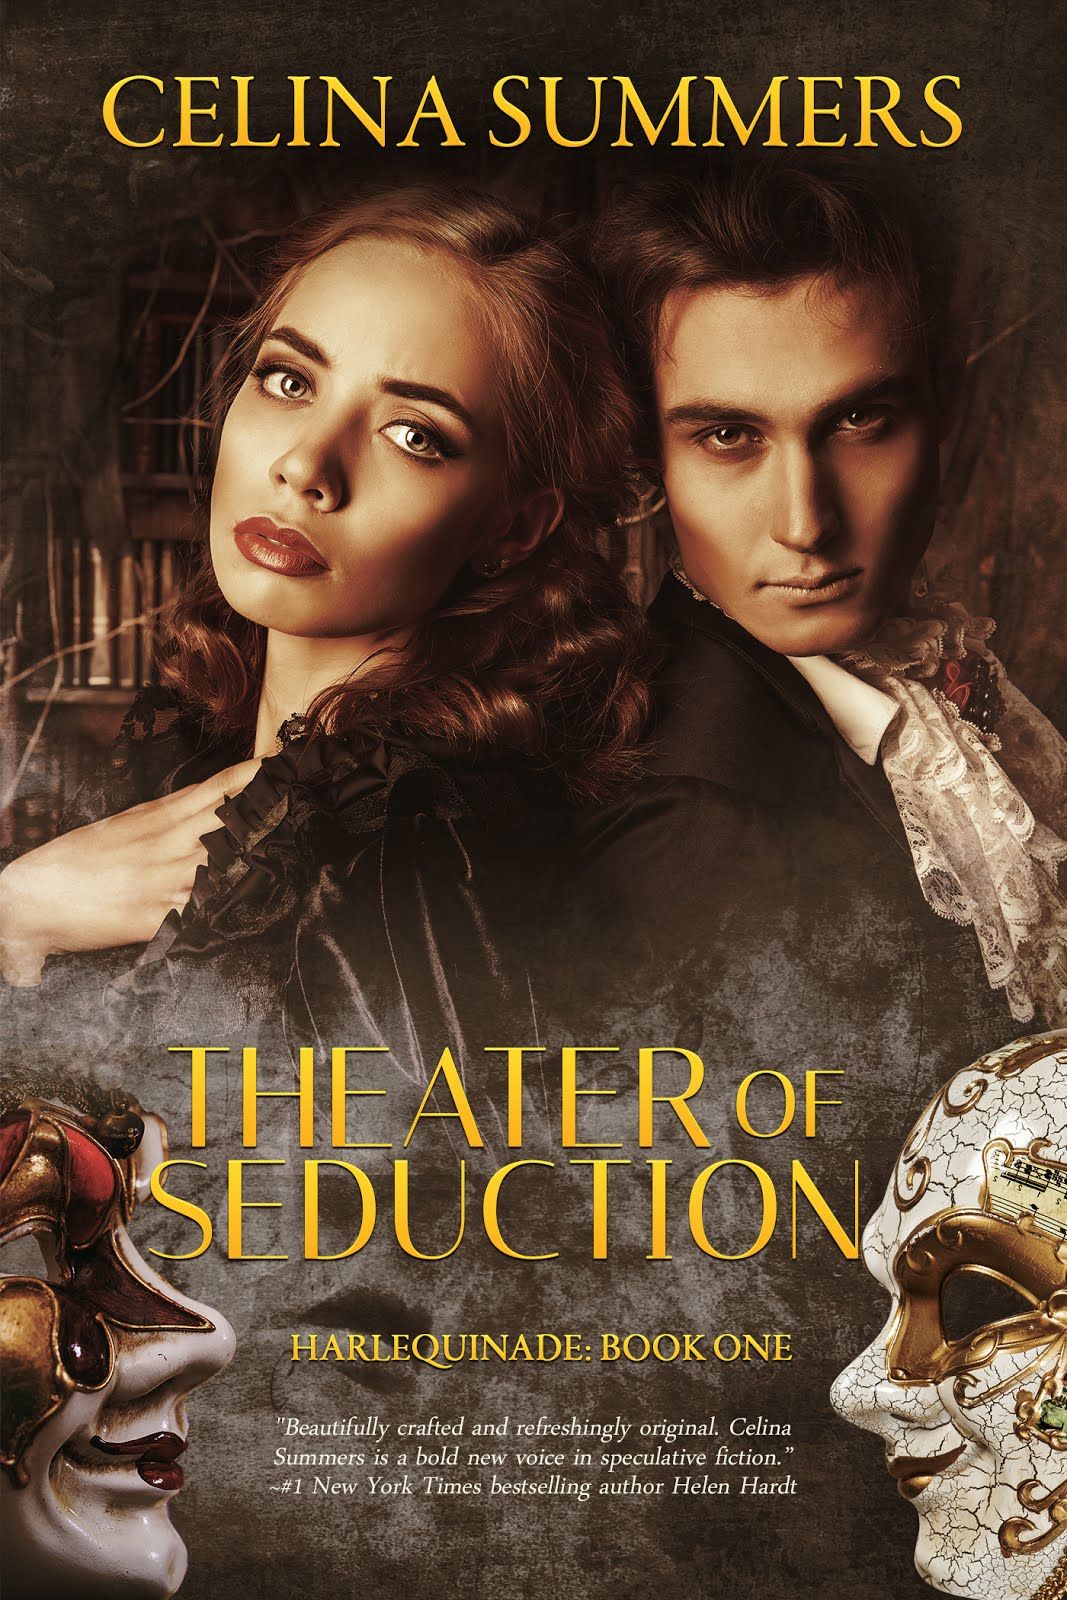 Theater of Seduction